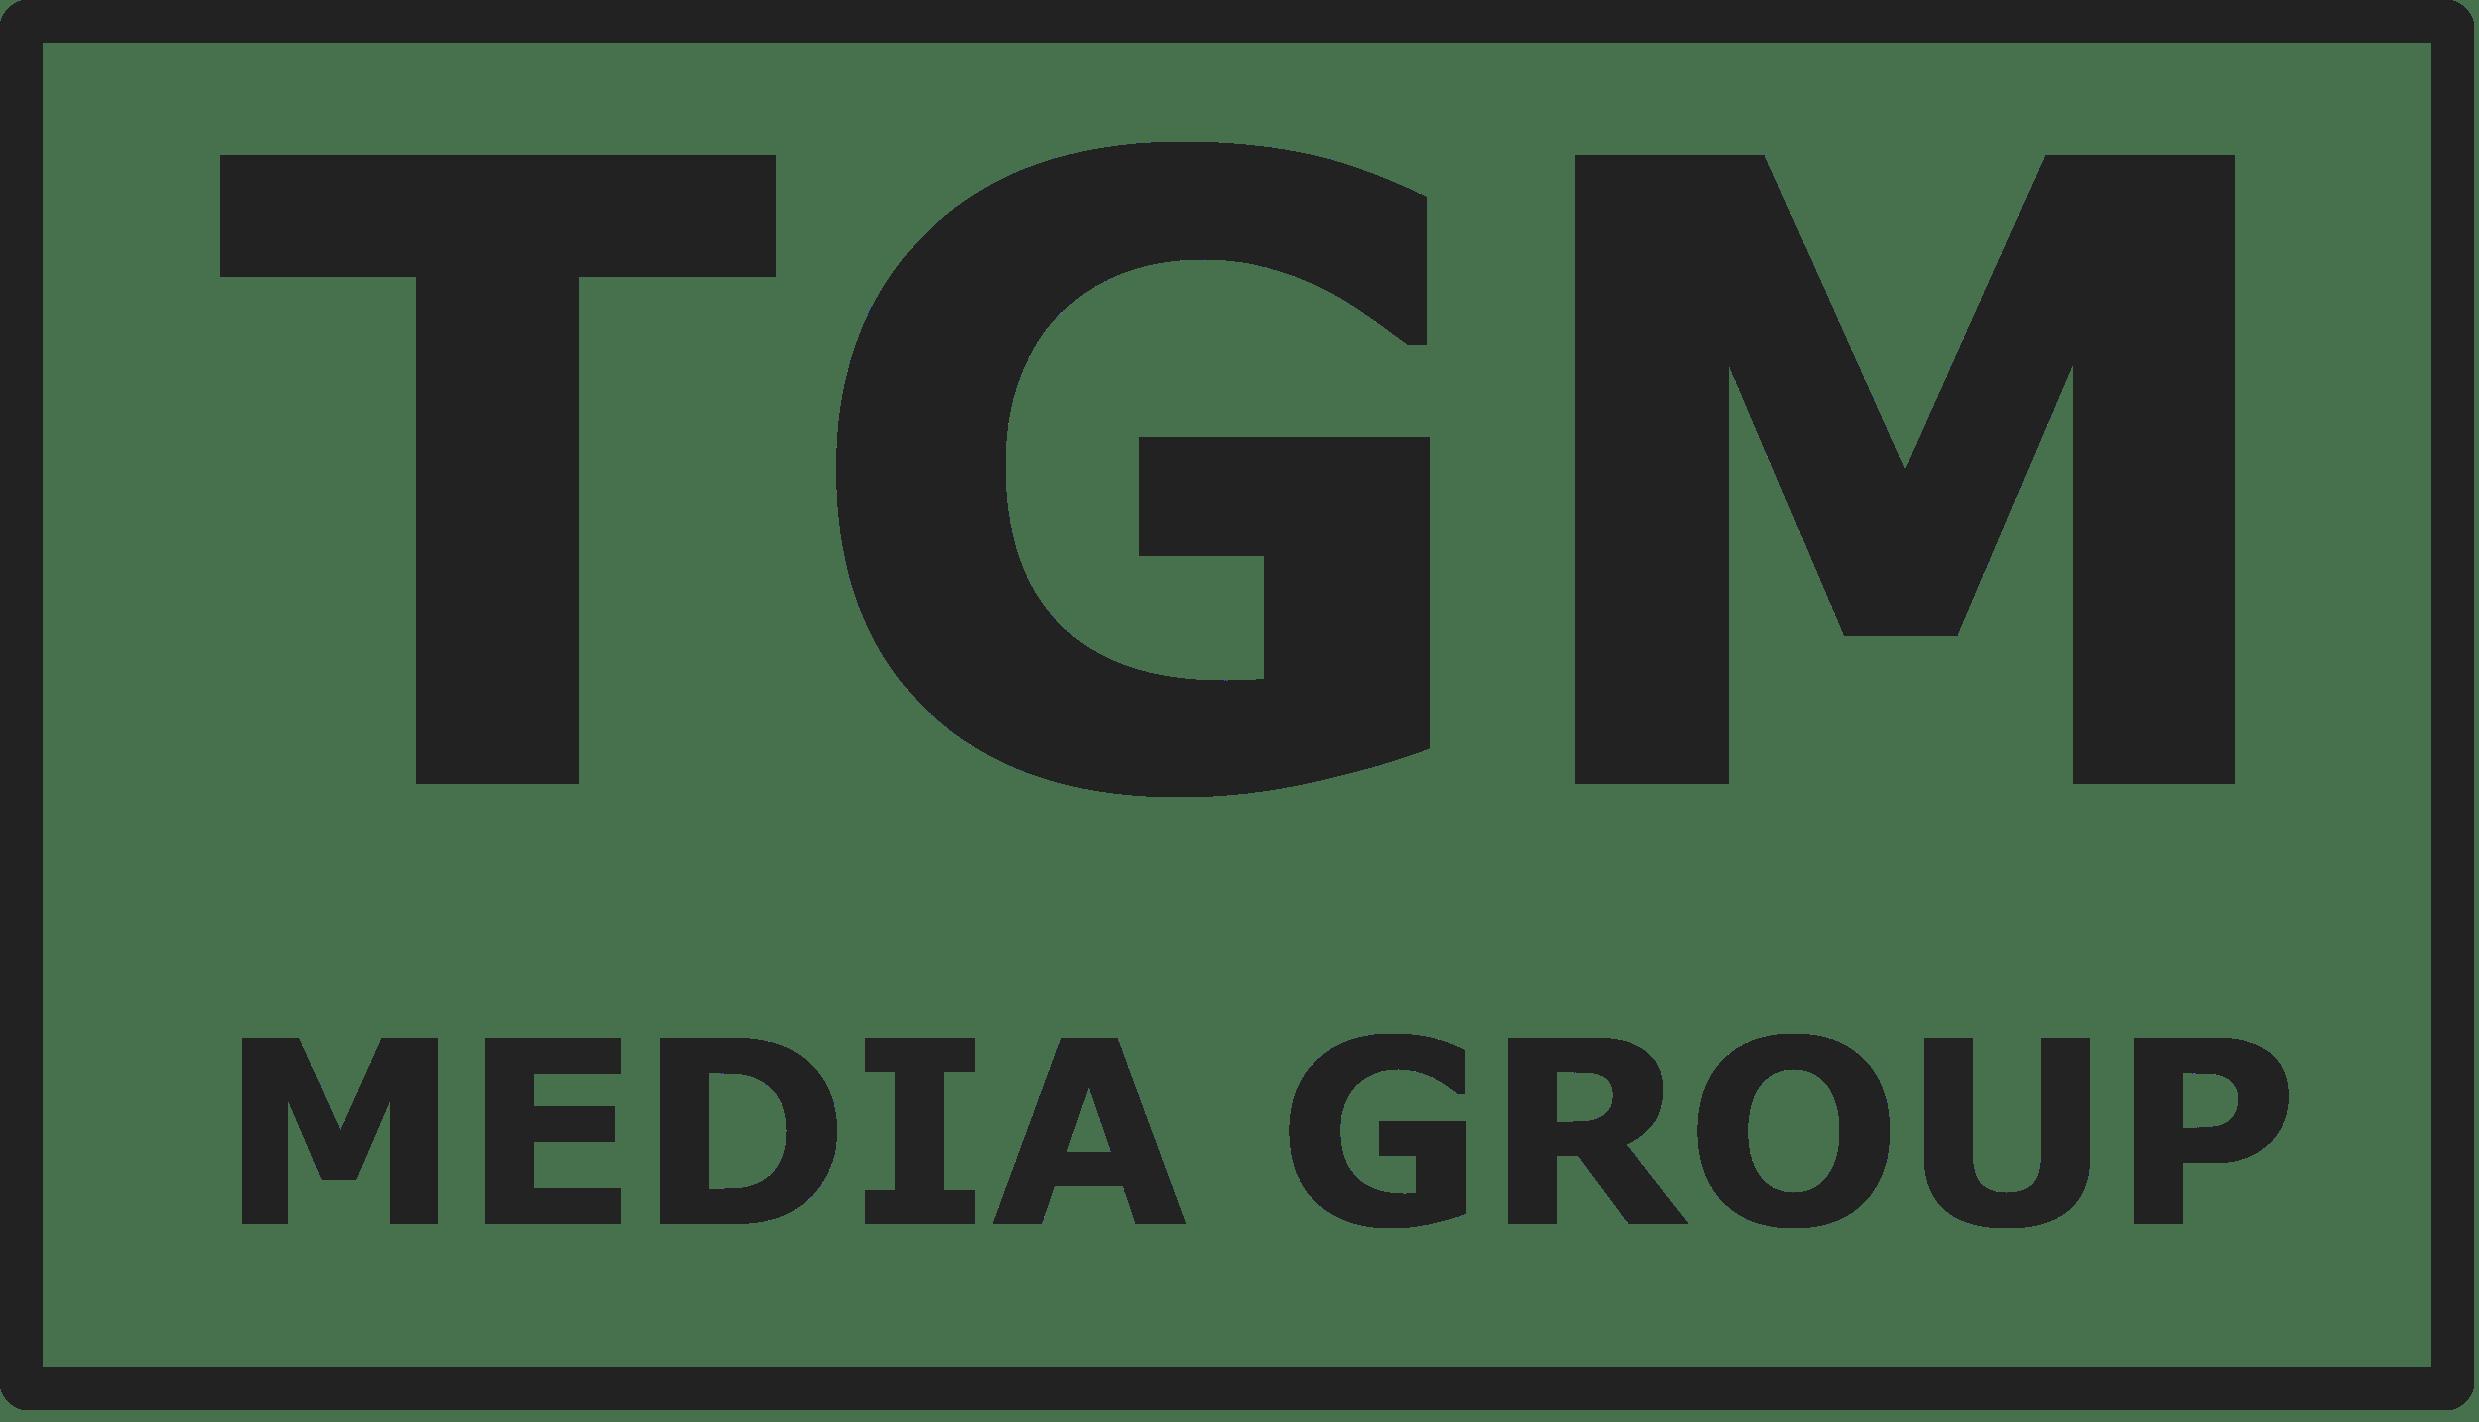 TGM Media Group